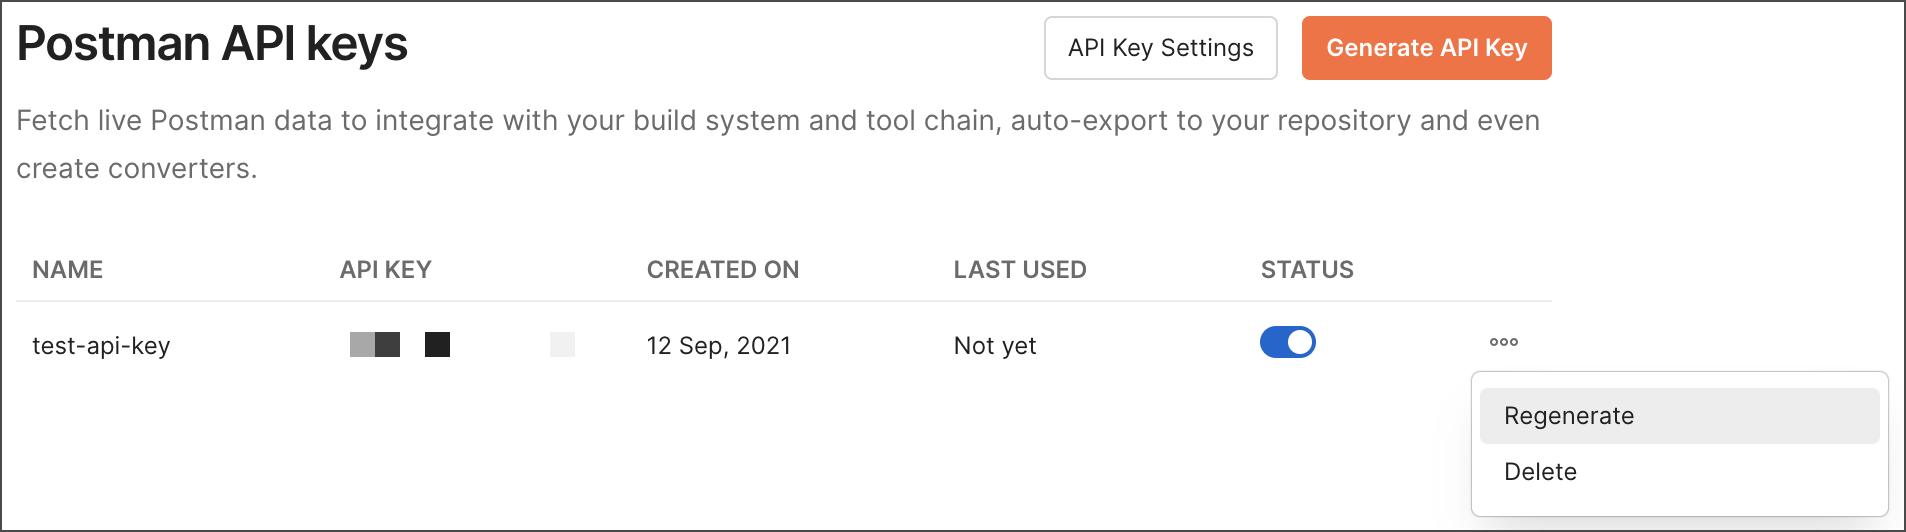 View your API keys